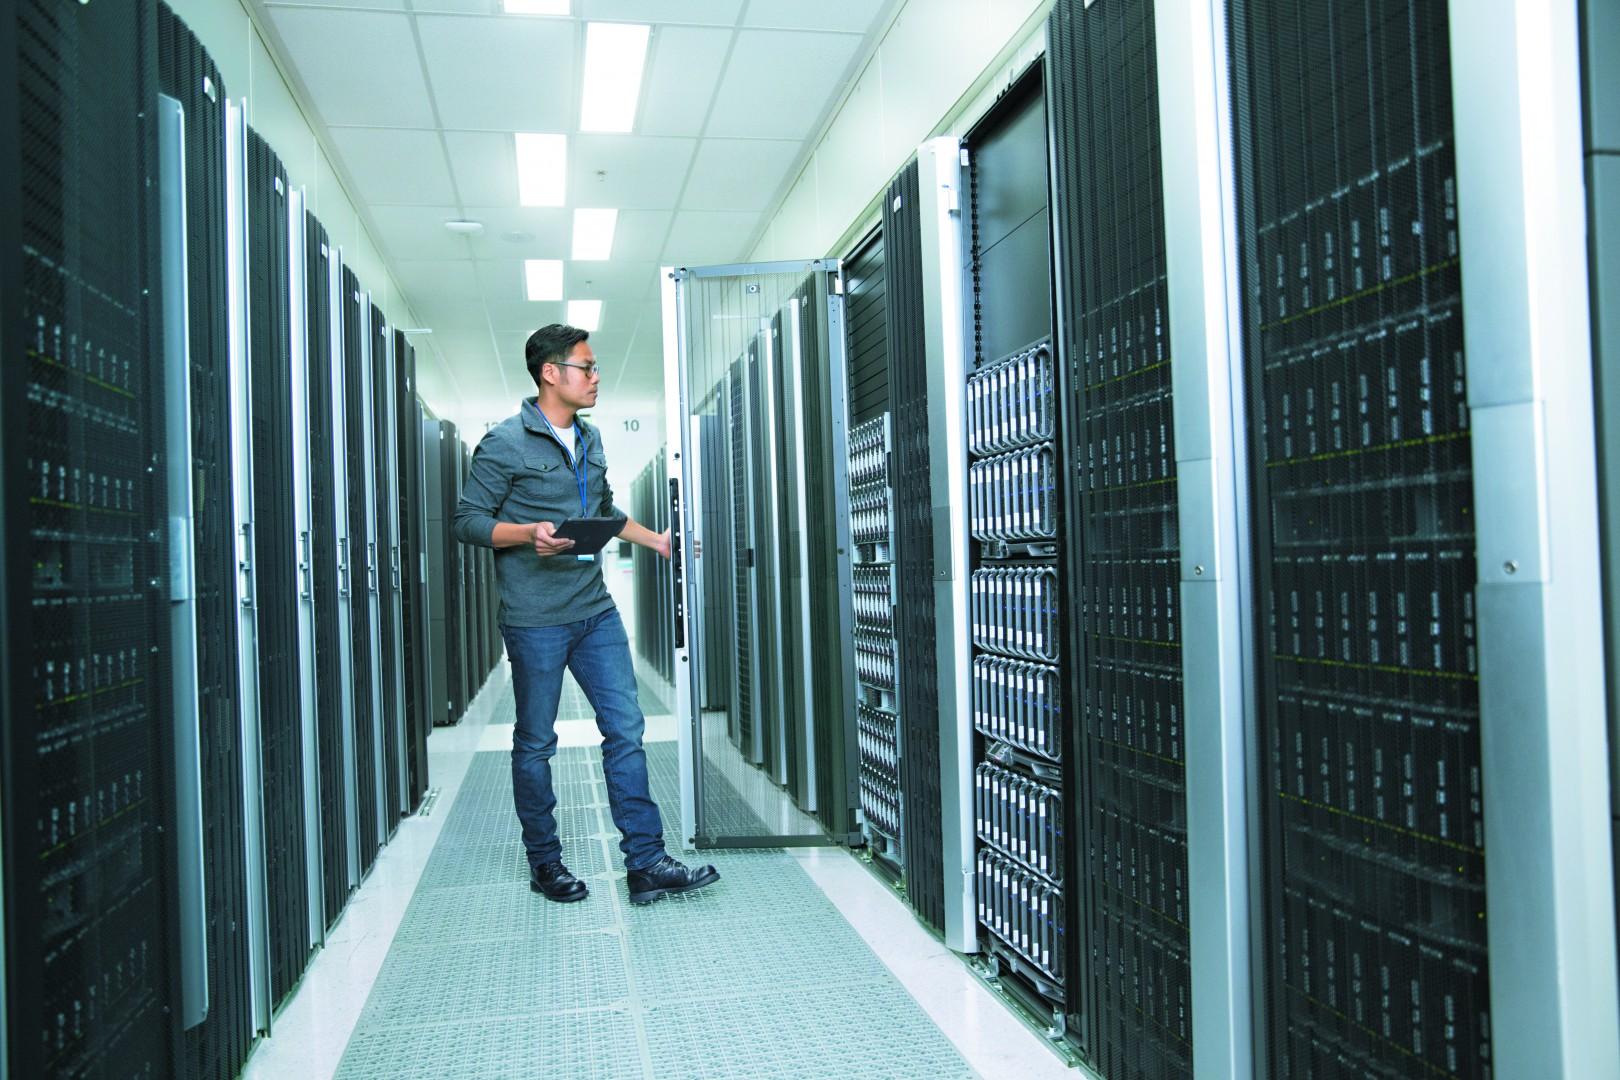 Intel Xeon Processor E7 v4 Server